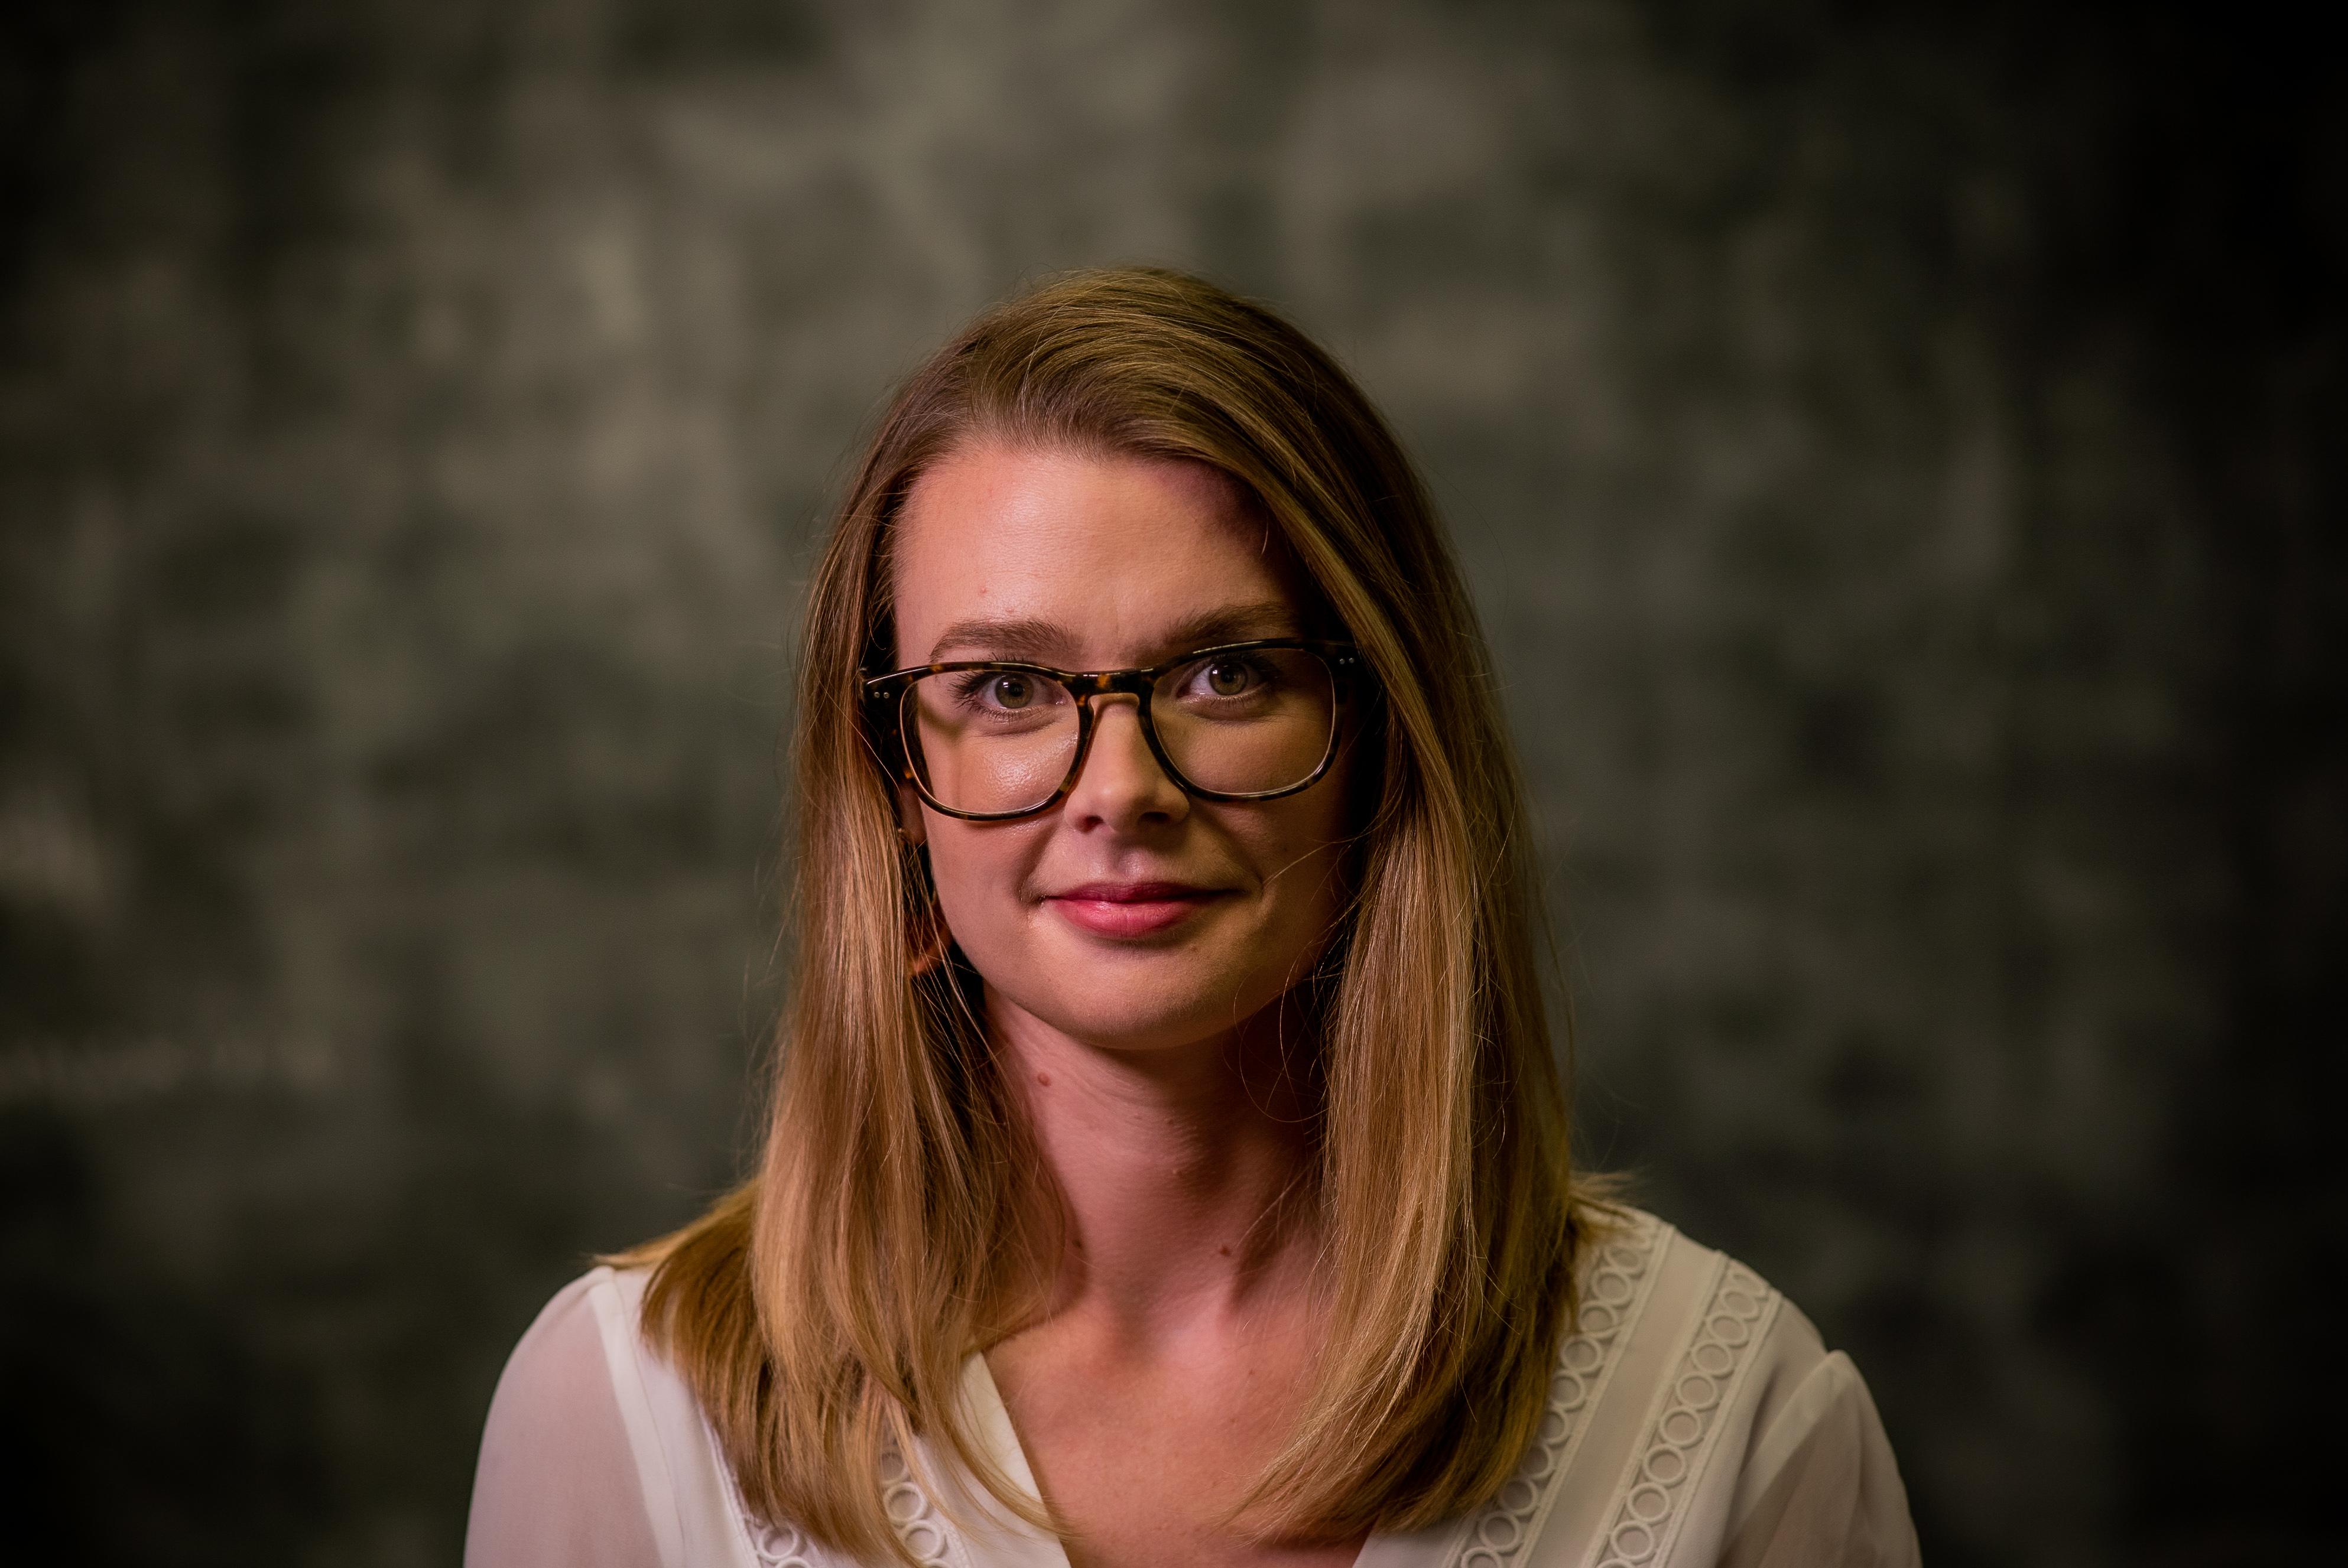 Jennifer Maclennan